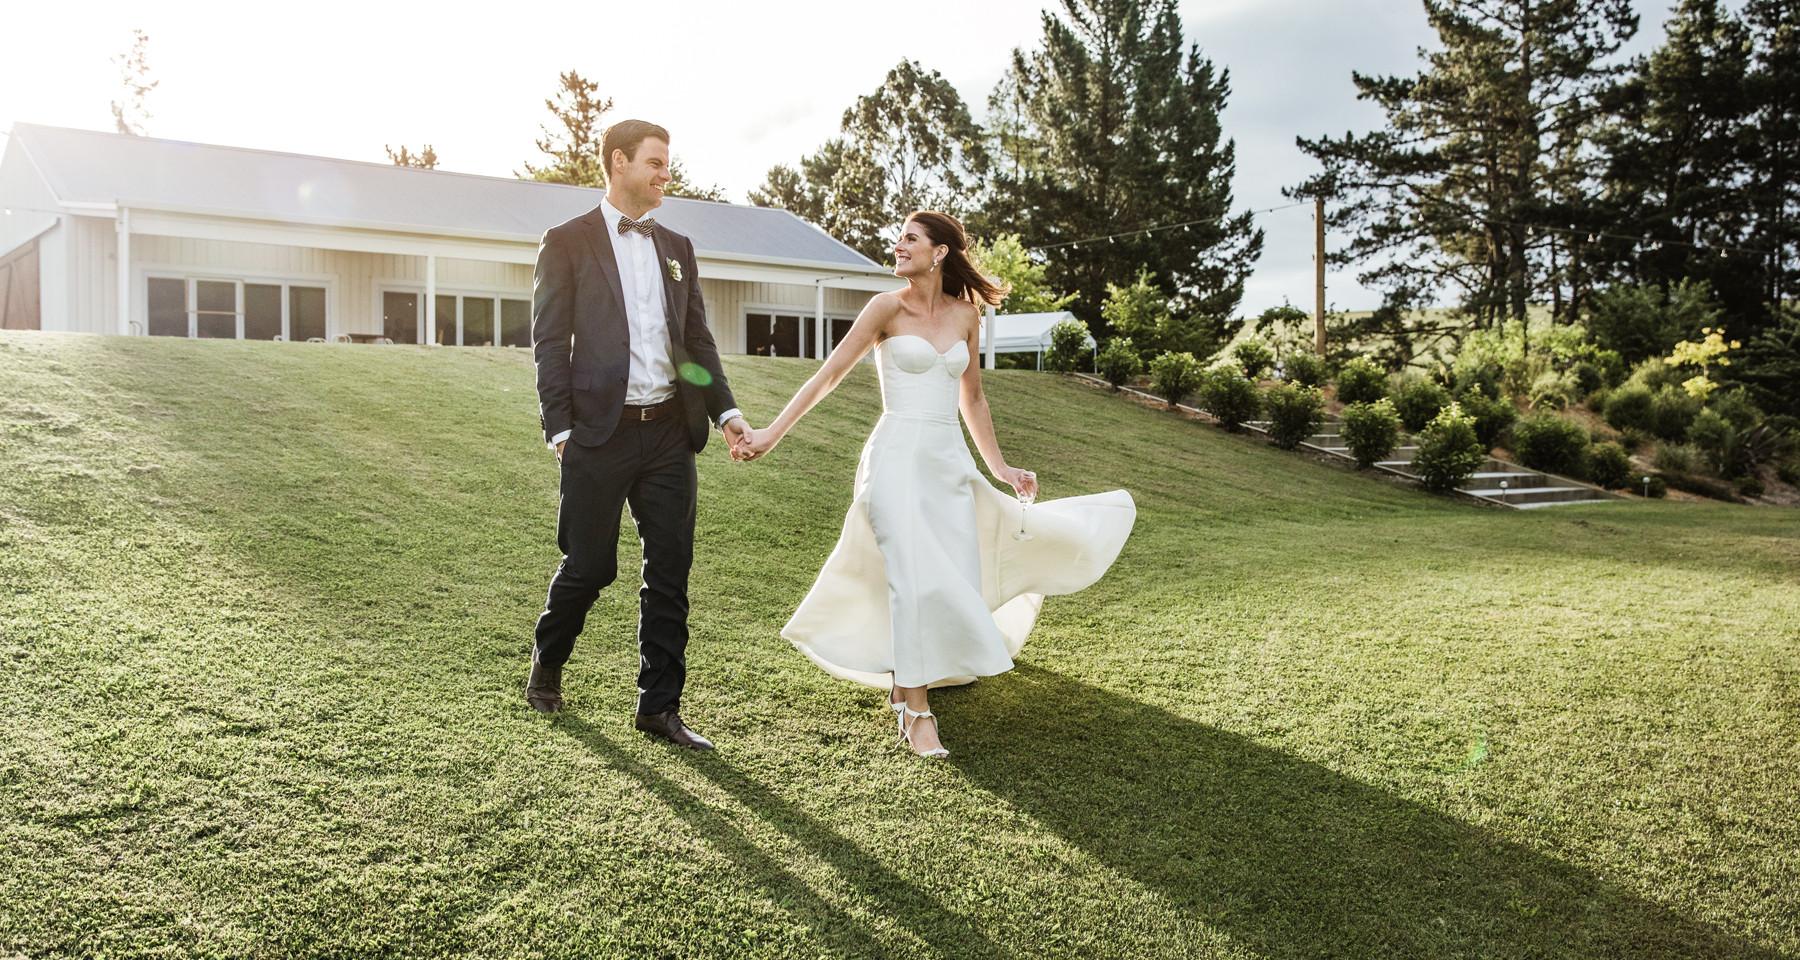 Country Wedding Taupo - Broadlands Lodge